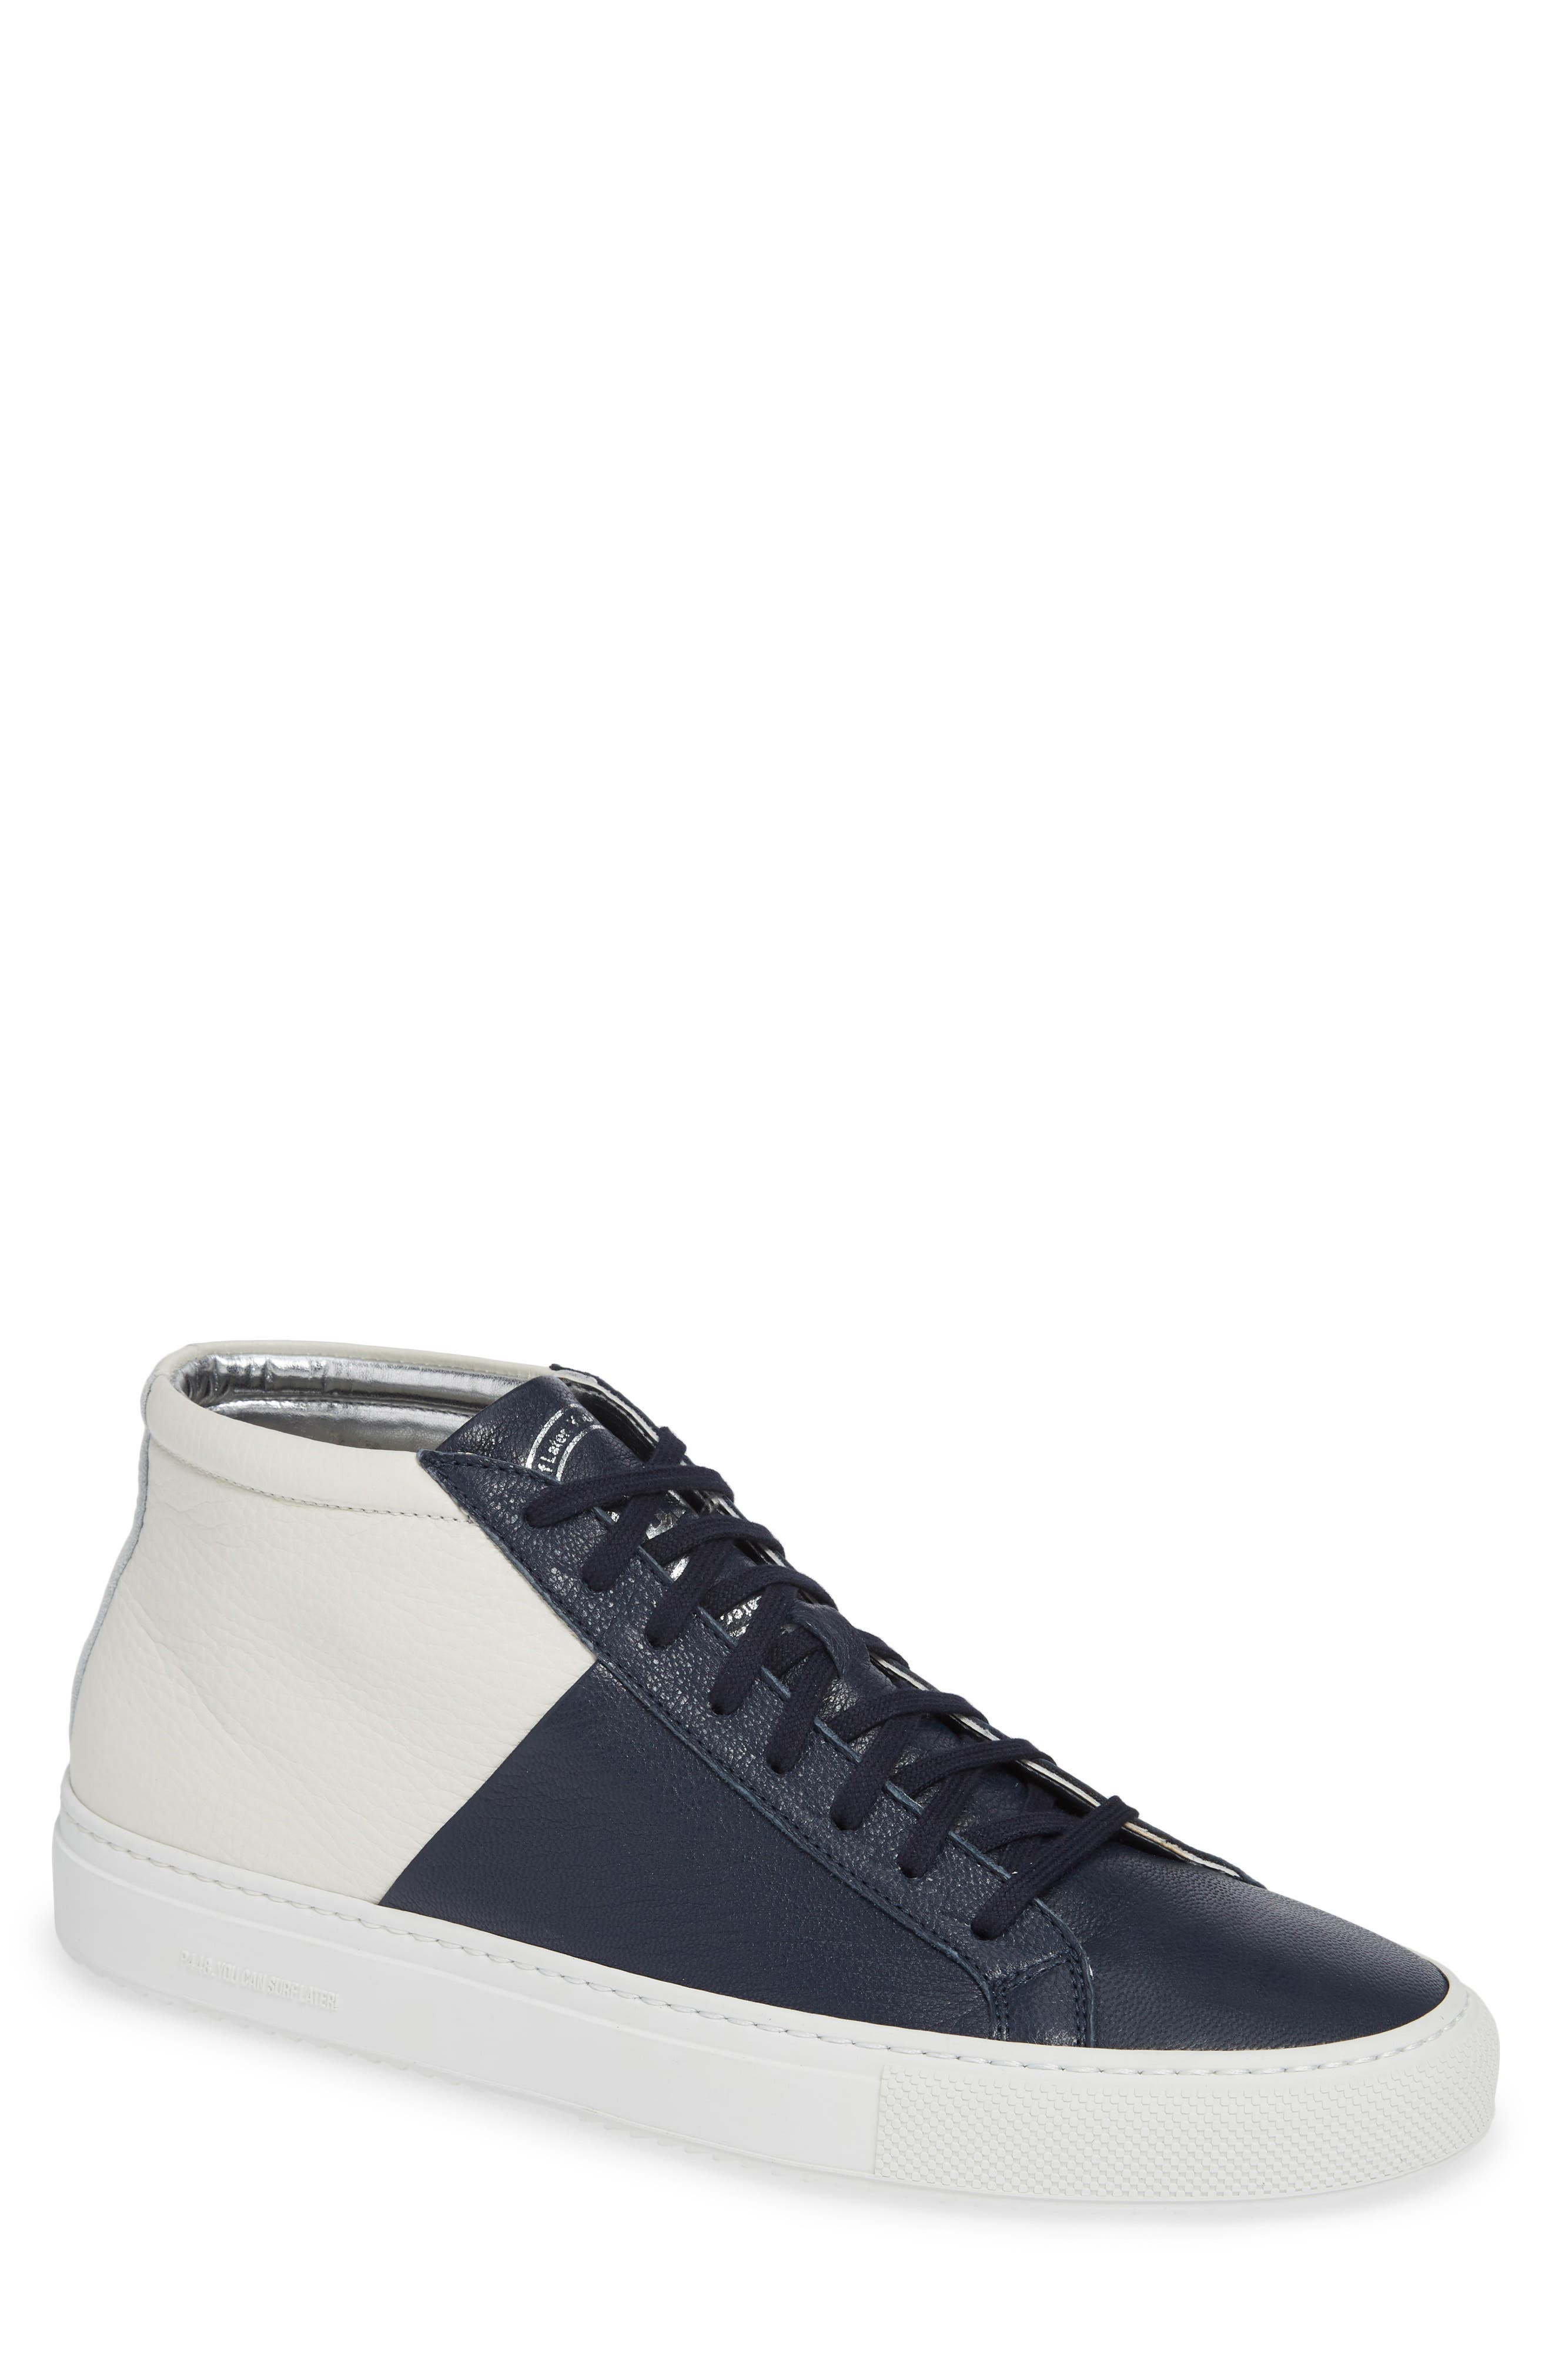 Eleven C Sneaker,                             Main thumbnail 1, color,                             NAVY